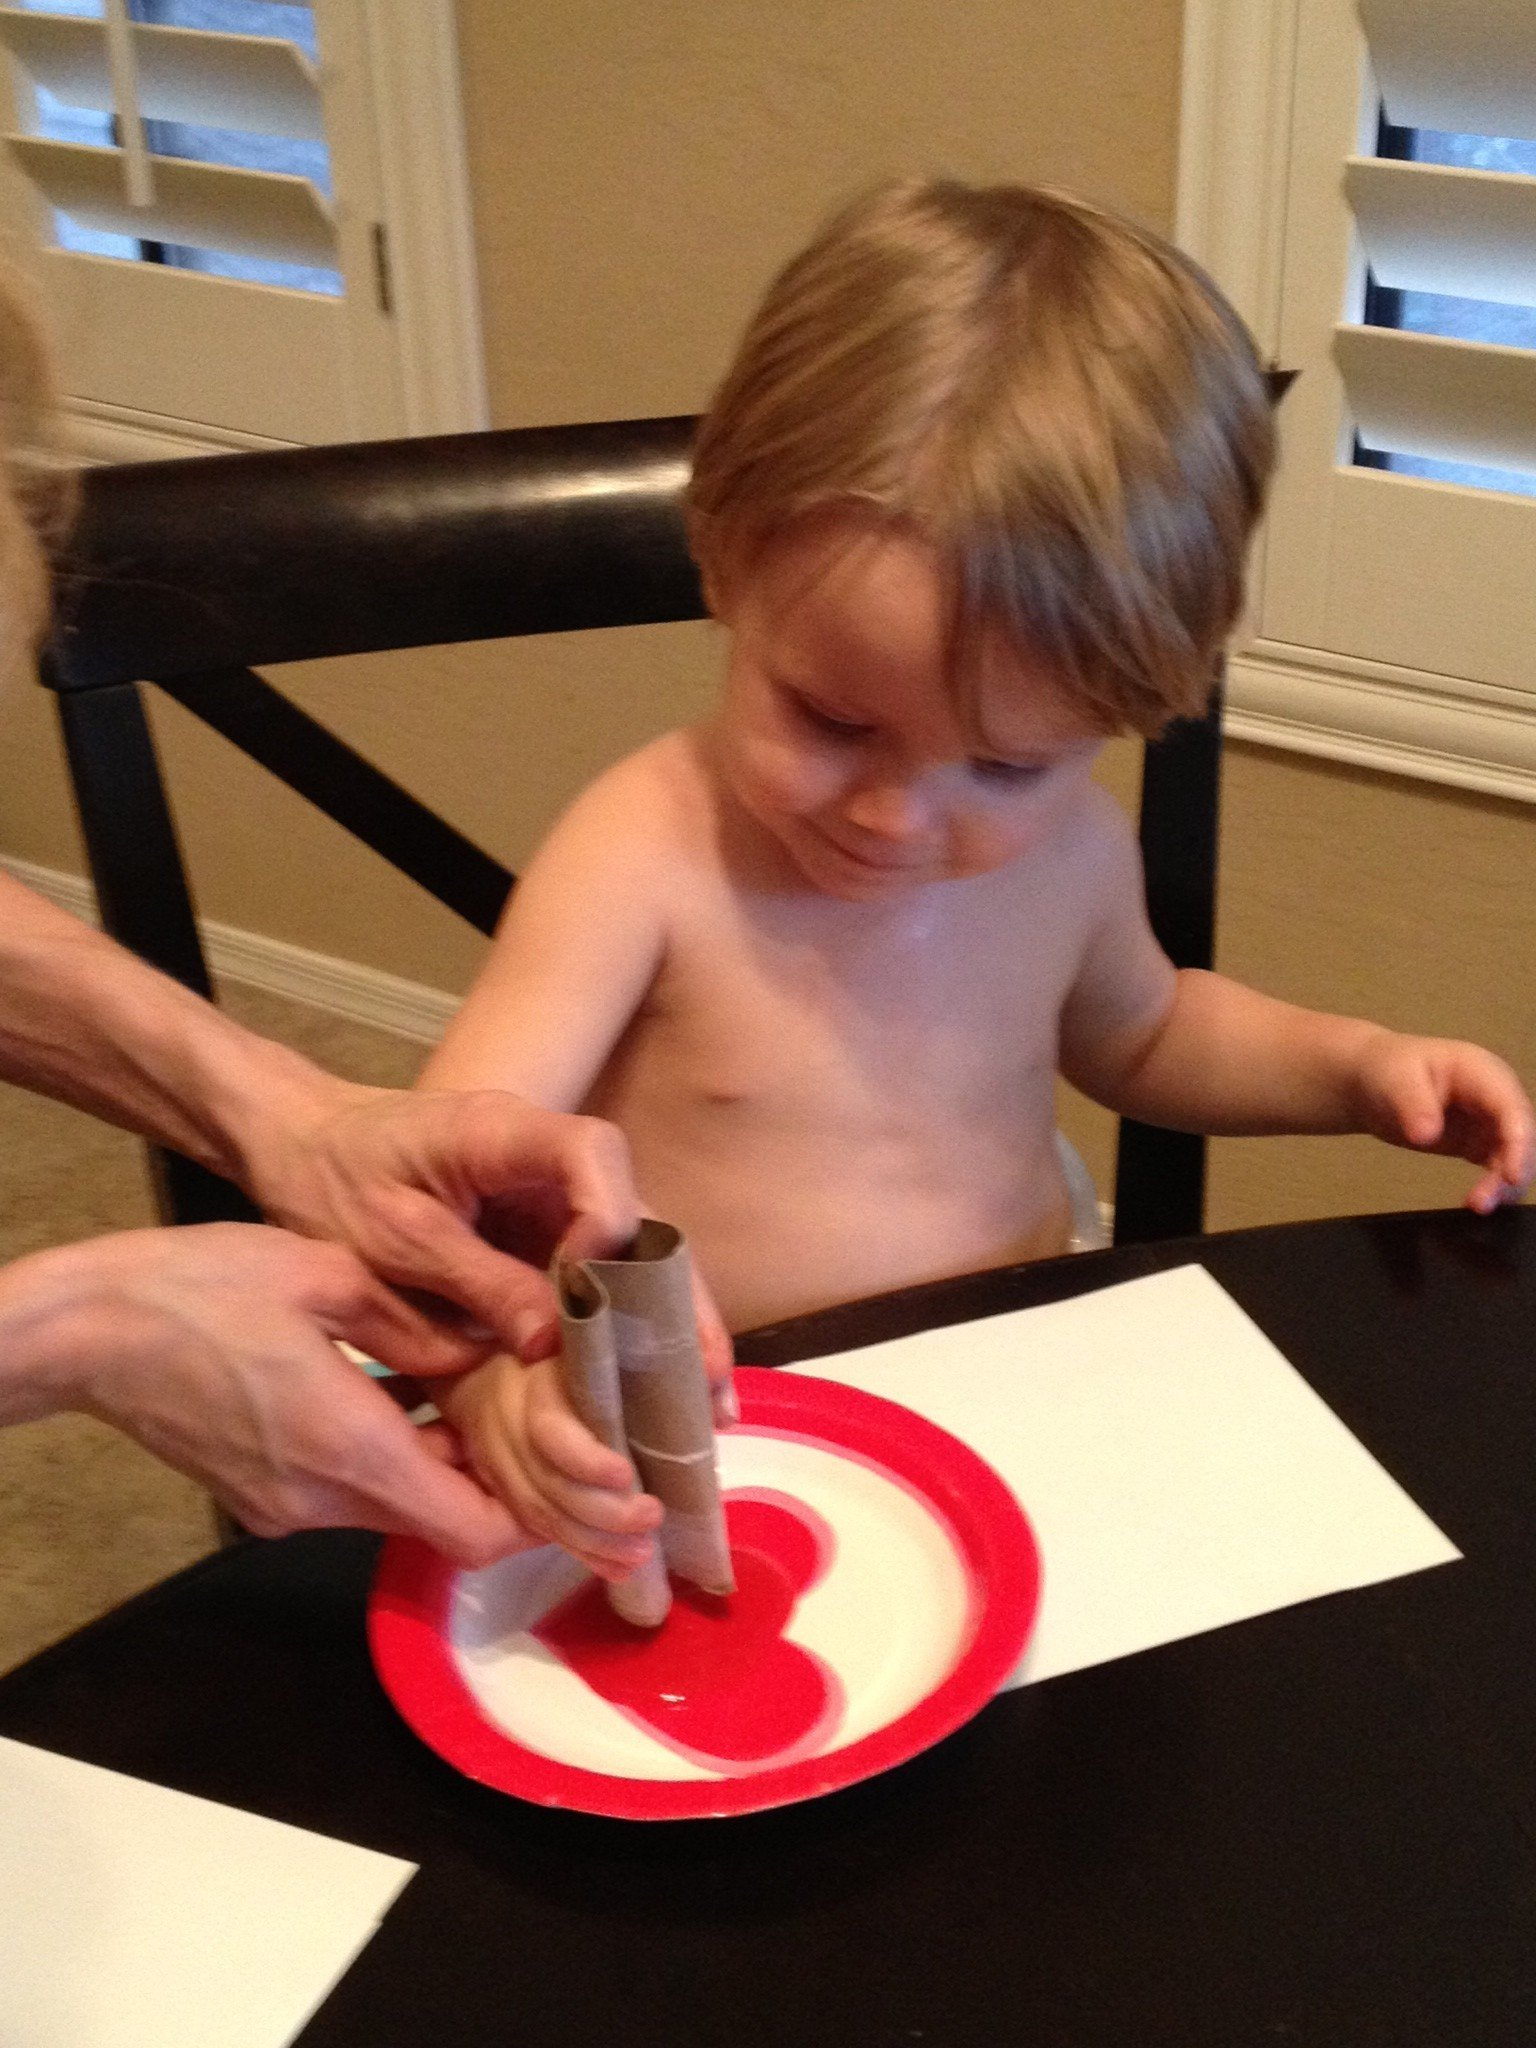 #PowellPack #ValentinesDay #Craft #KidsCrafts #HeidiPowell